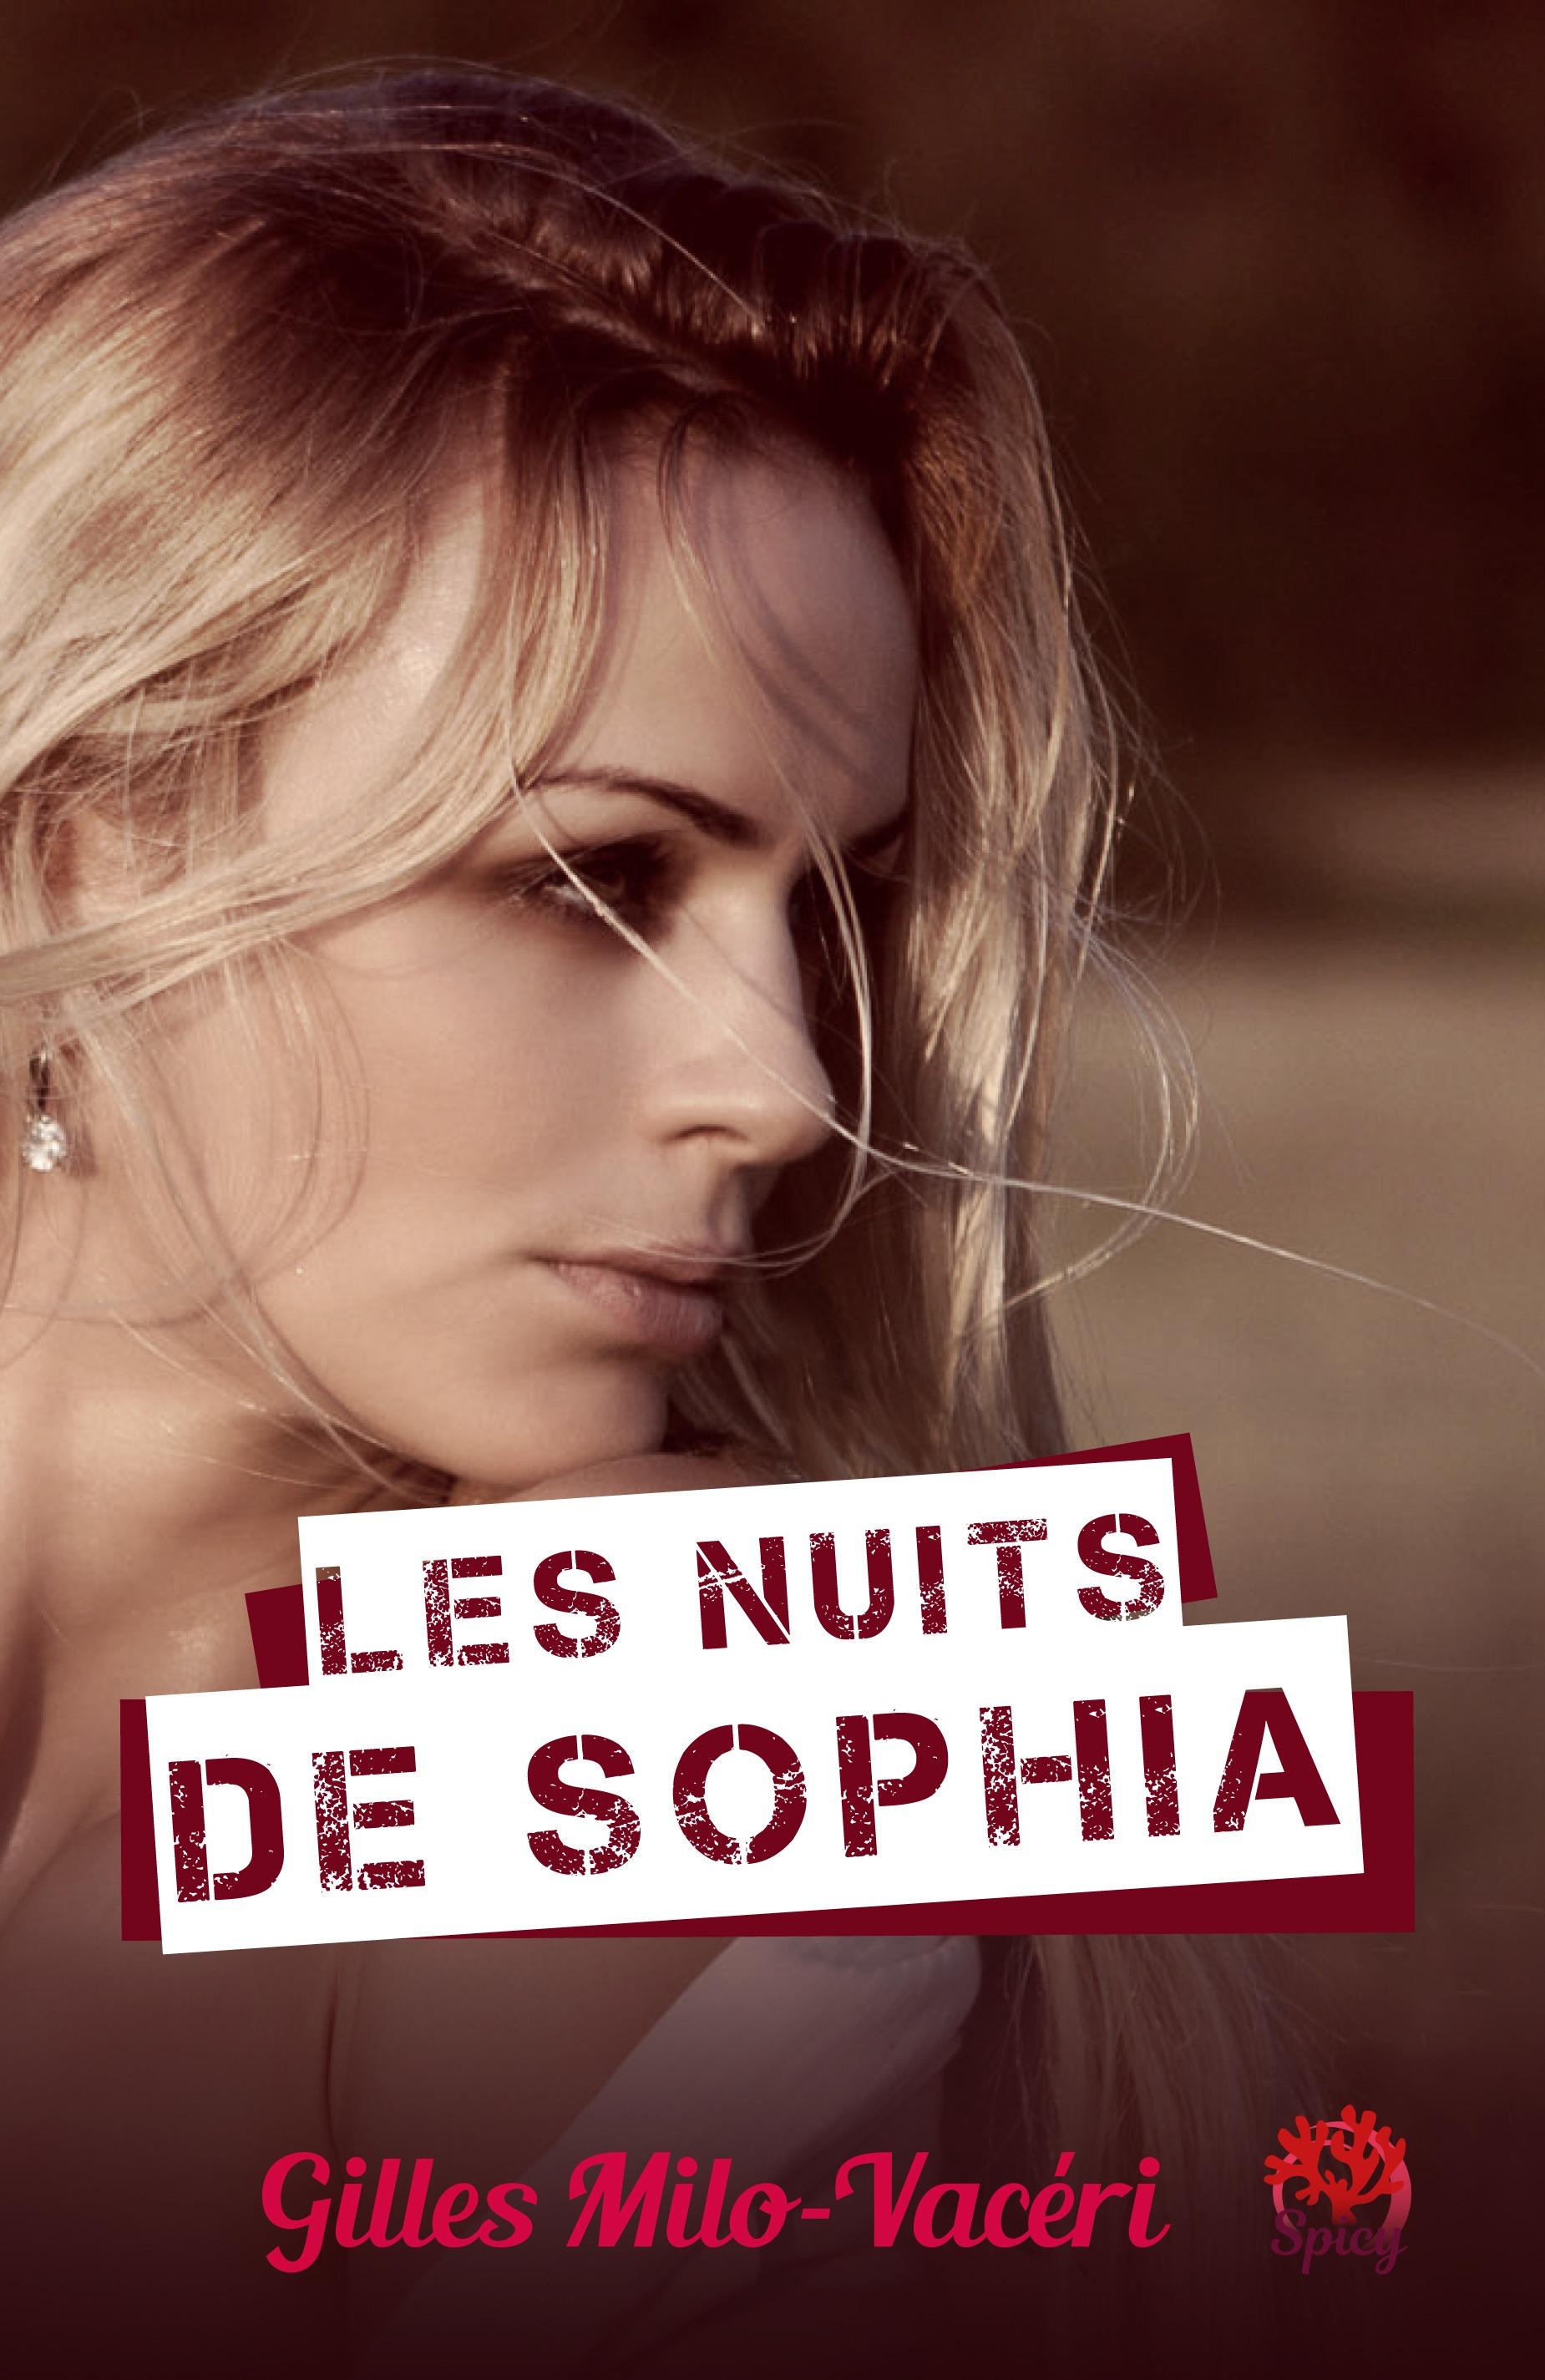 Les nuits de Sophia